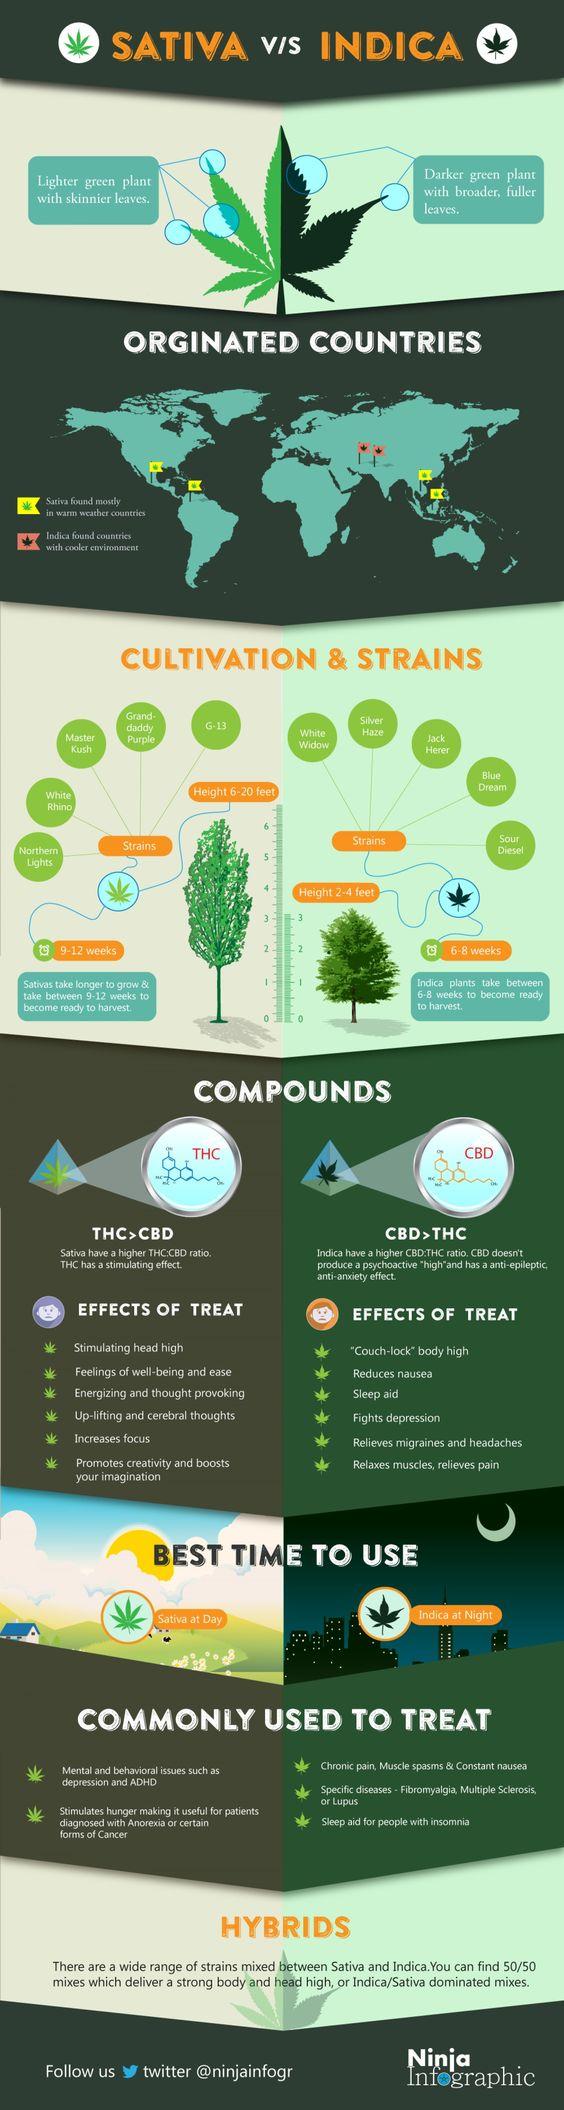 GrassRootsRX-Sativa-vs-Indica-infographic.jpg